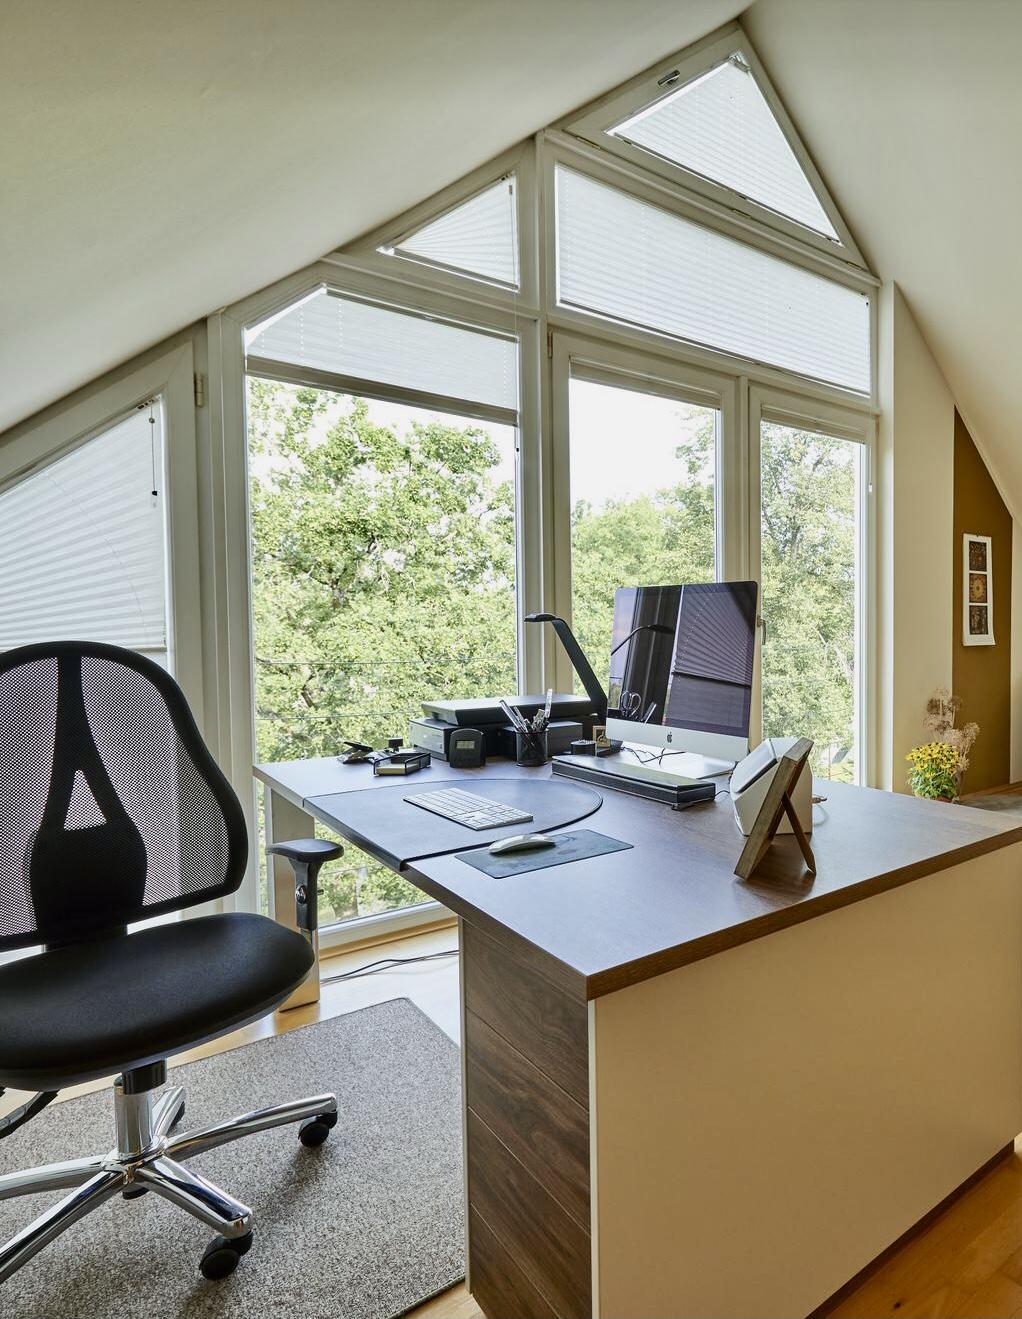 www.ideenraumgeben.de-umgestaltung-eines-grossen-home-office-mit-toller-aussicht-66d1c67a-bef0-45de-9ef1-0f61c58fe5f9